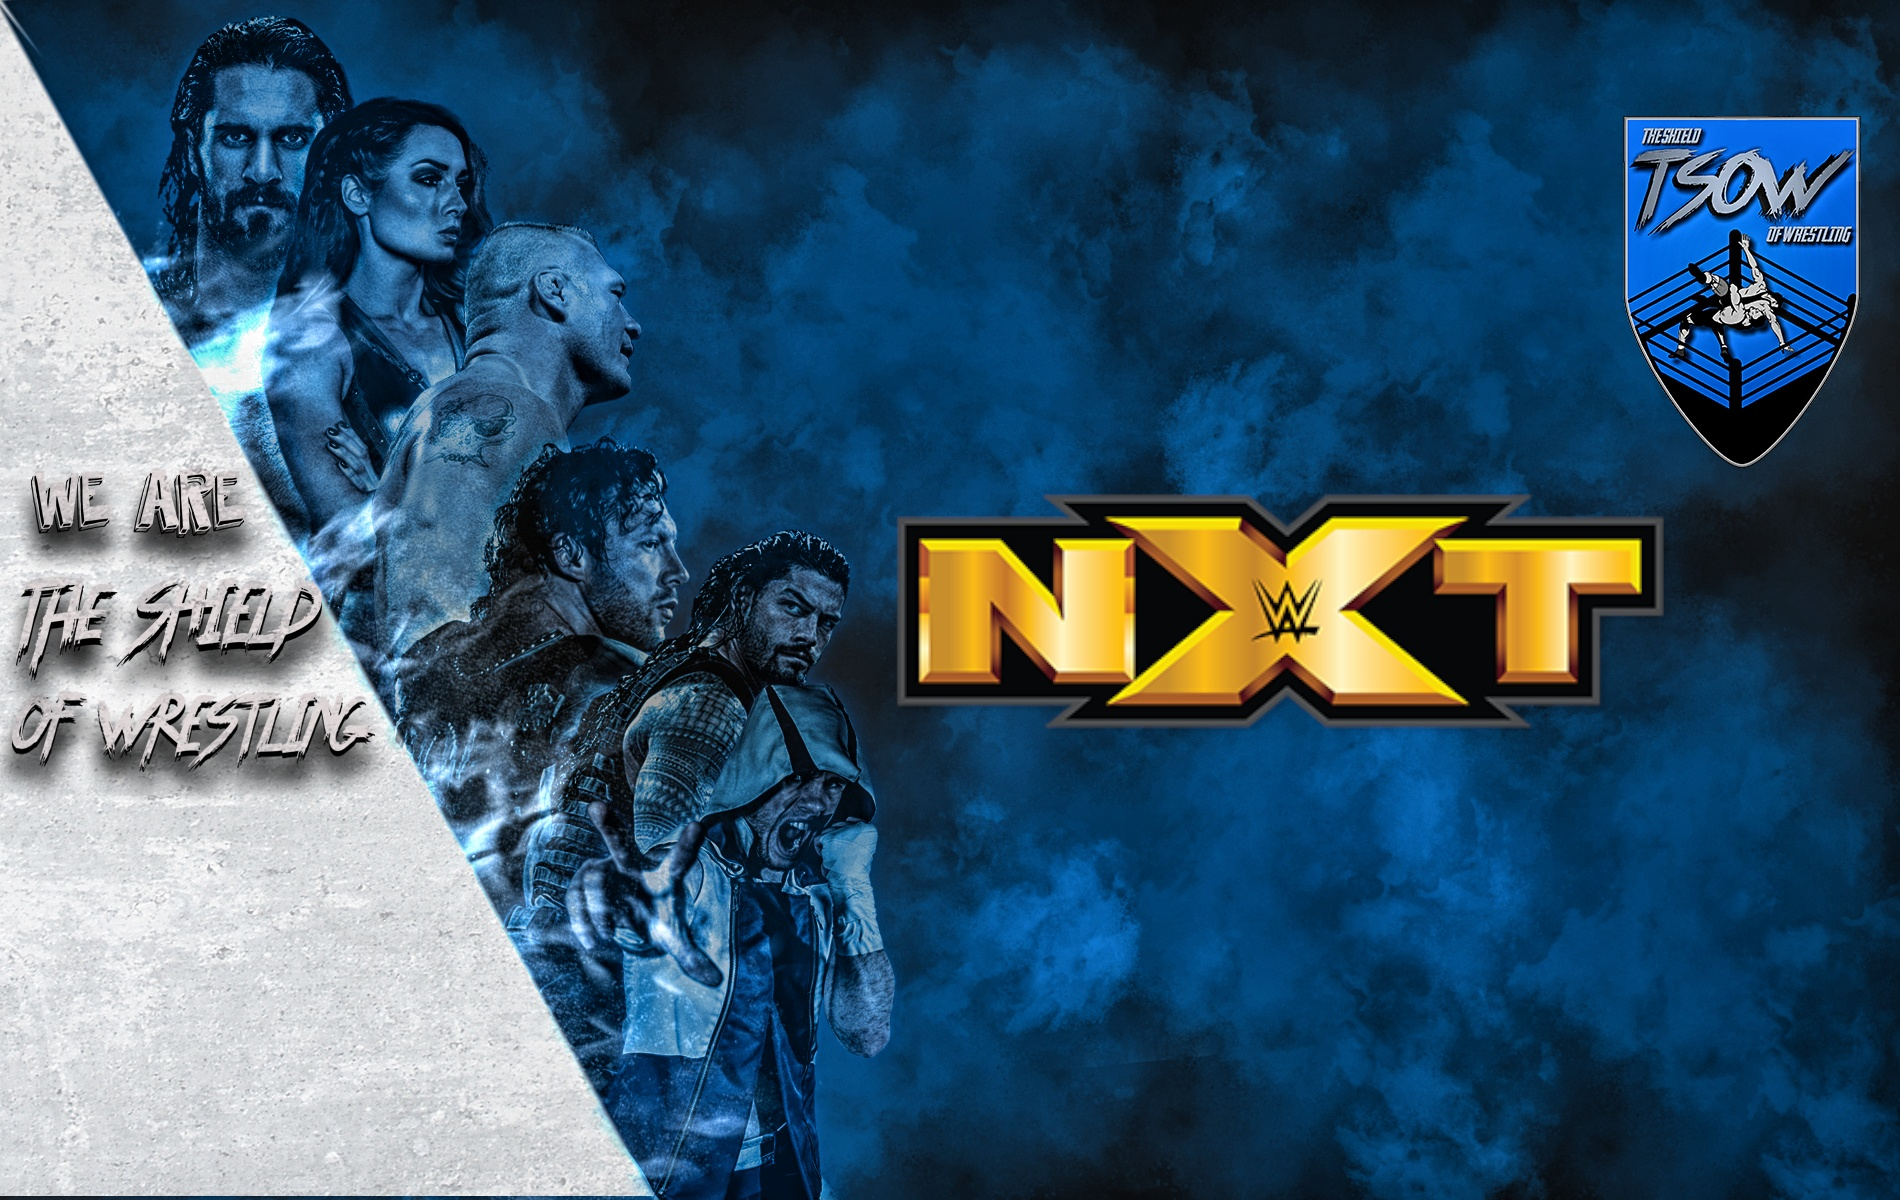 Titoli di coppia NXT - WWE